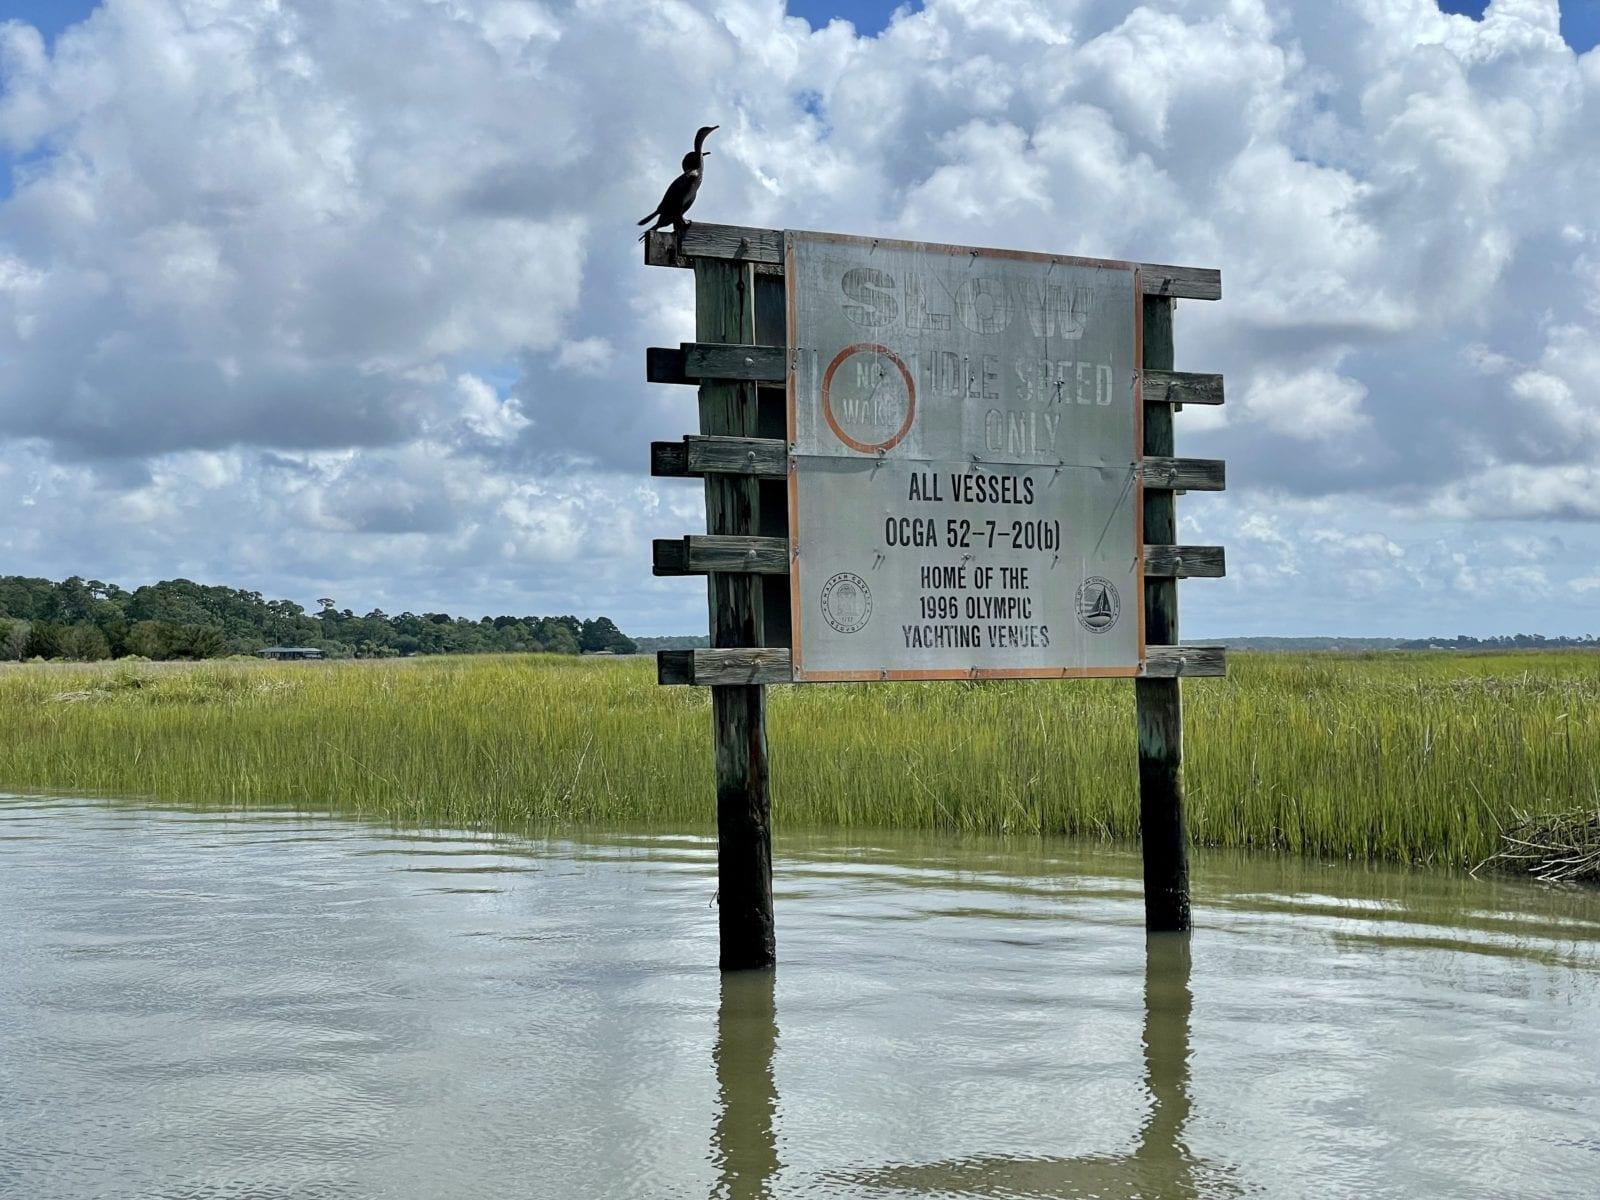 No Wake Zone Isle of Hope